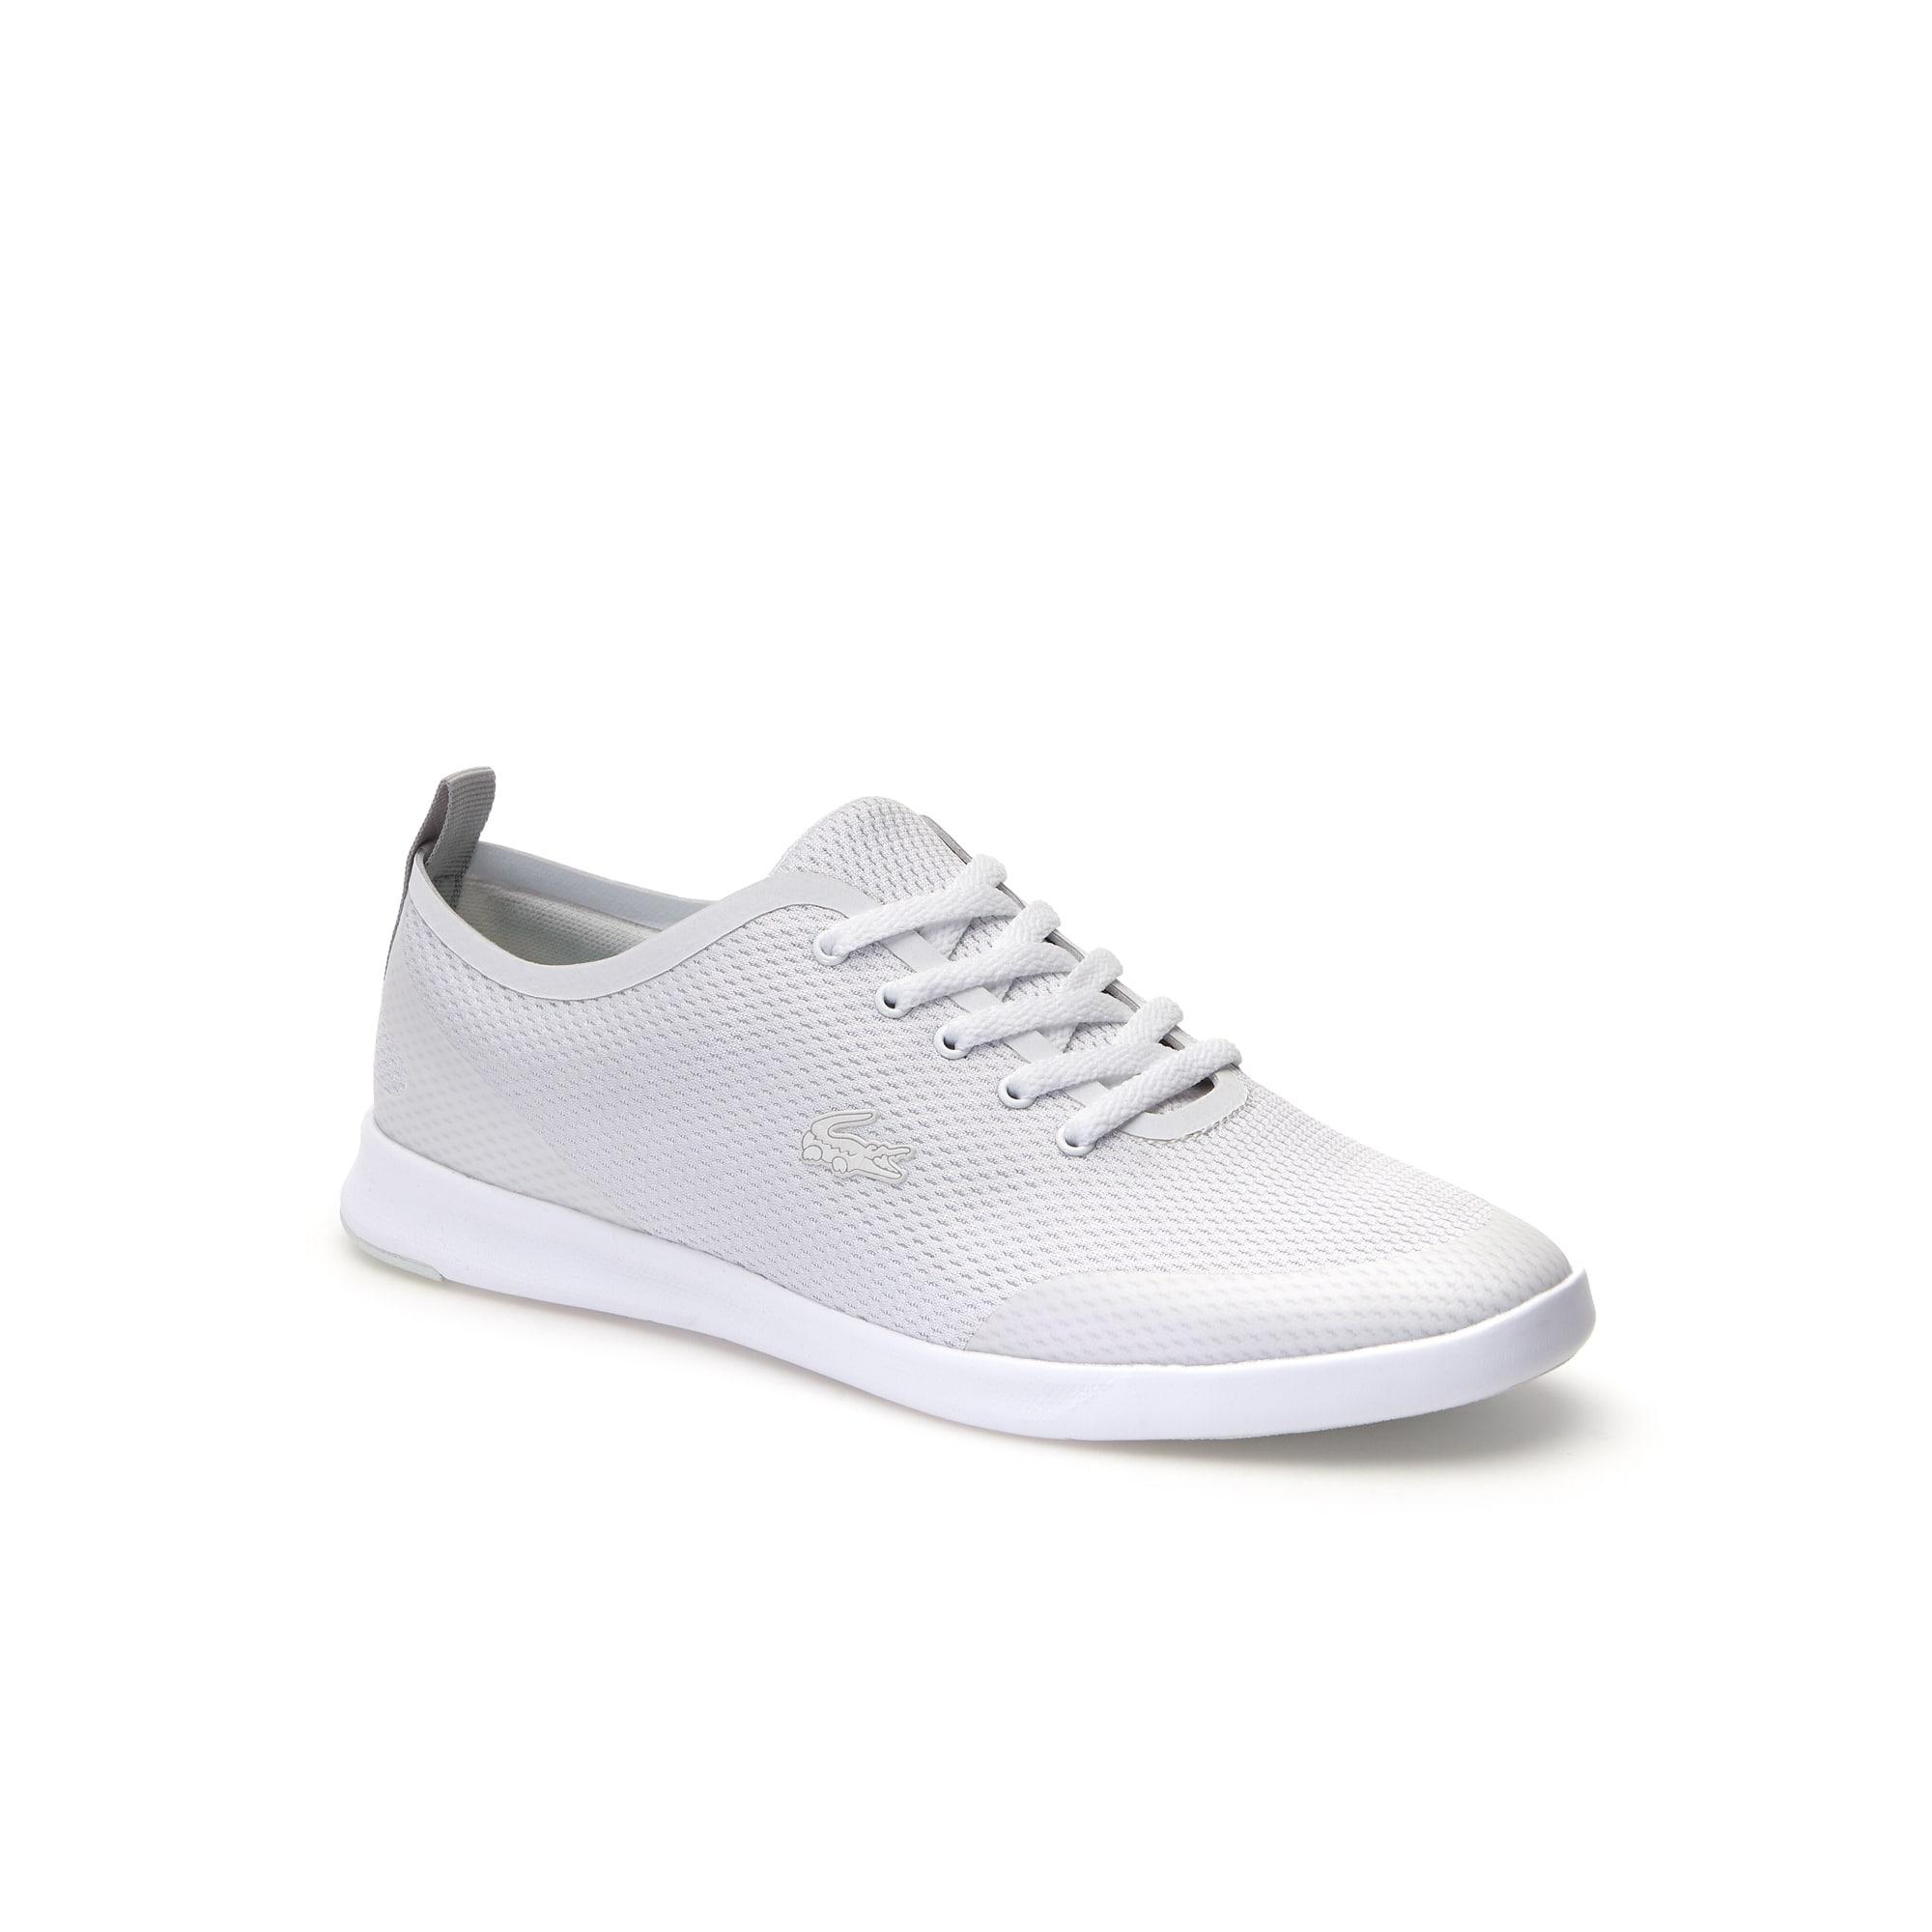 Zapatillas Mujer Avenir 118 1